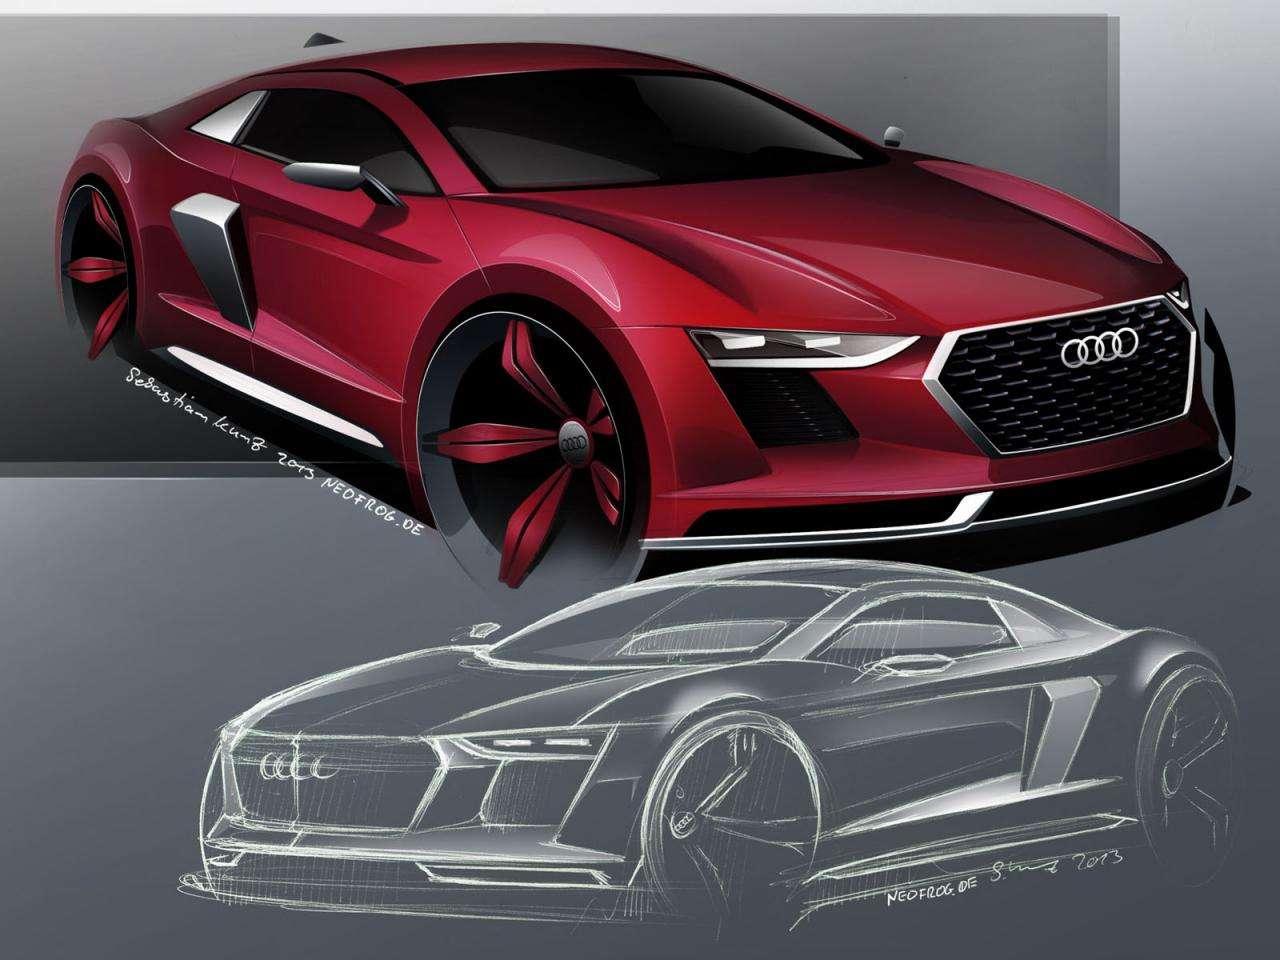 Audi R8 2015 rendering